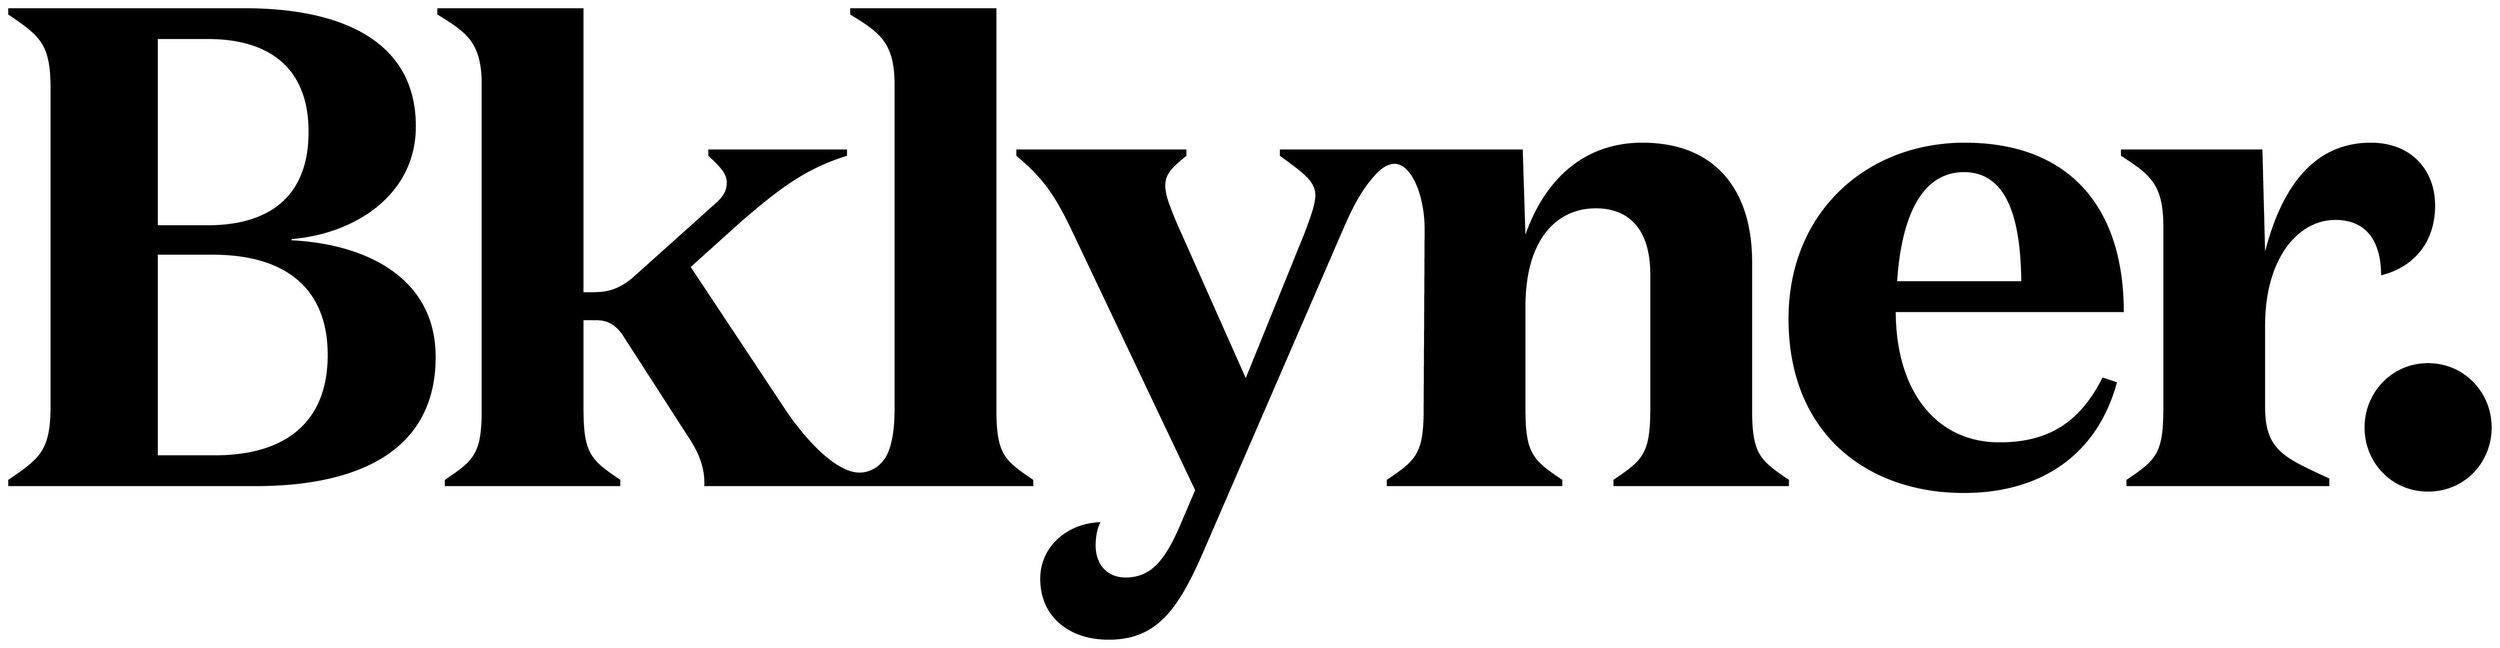 Bklyner-Logotype-Black.jpg